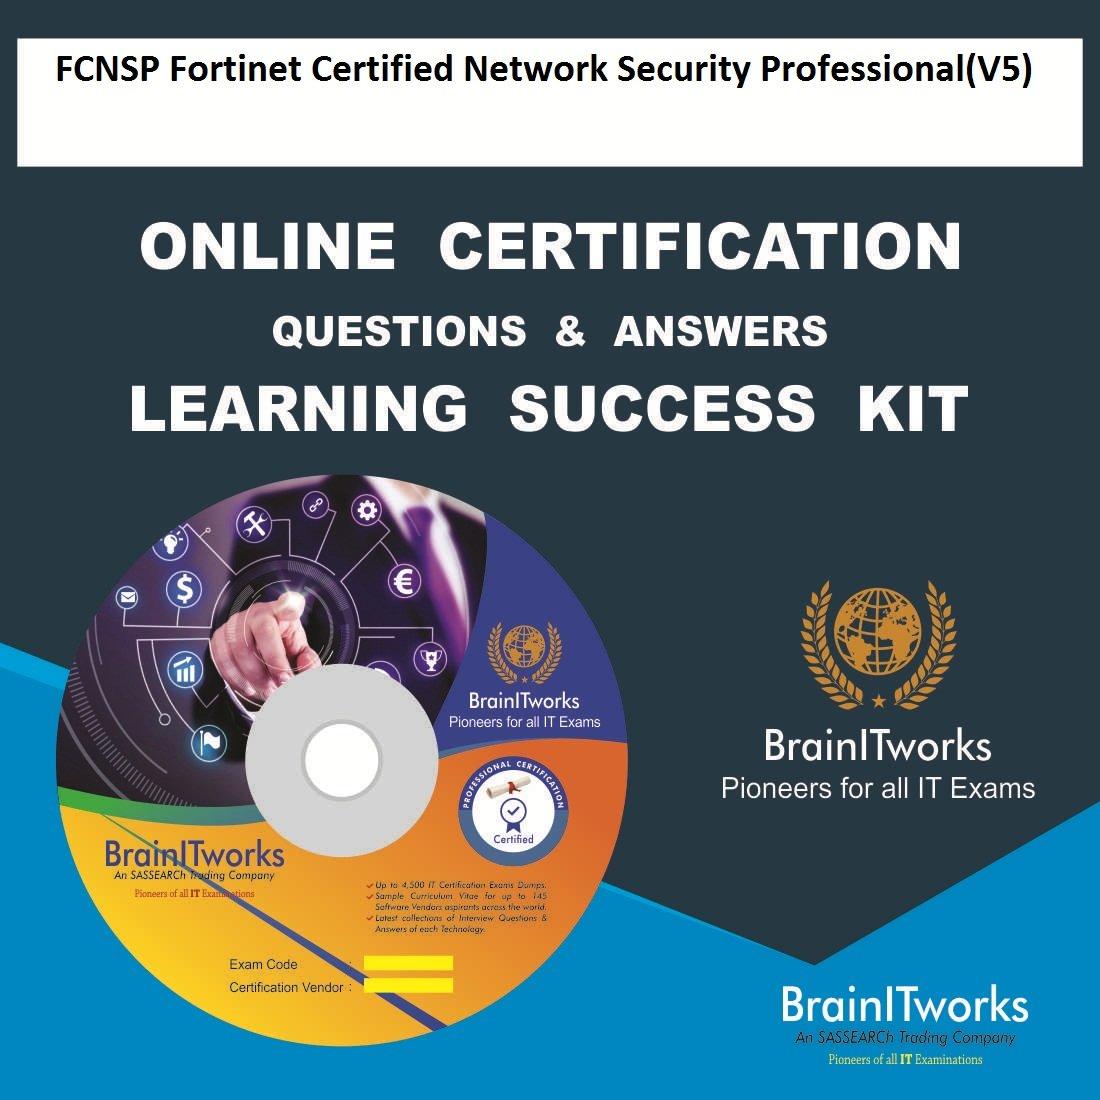 Fcnsp Fortinet Certified Network Security Professional V5 Online